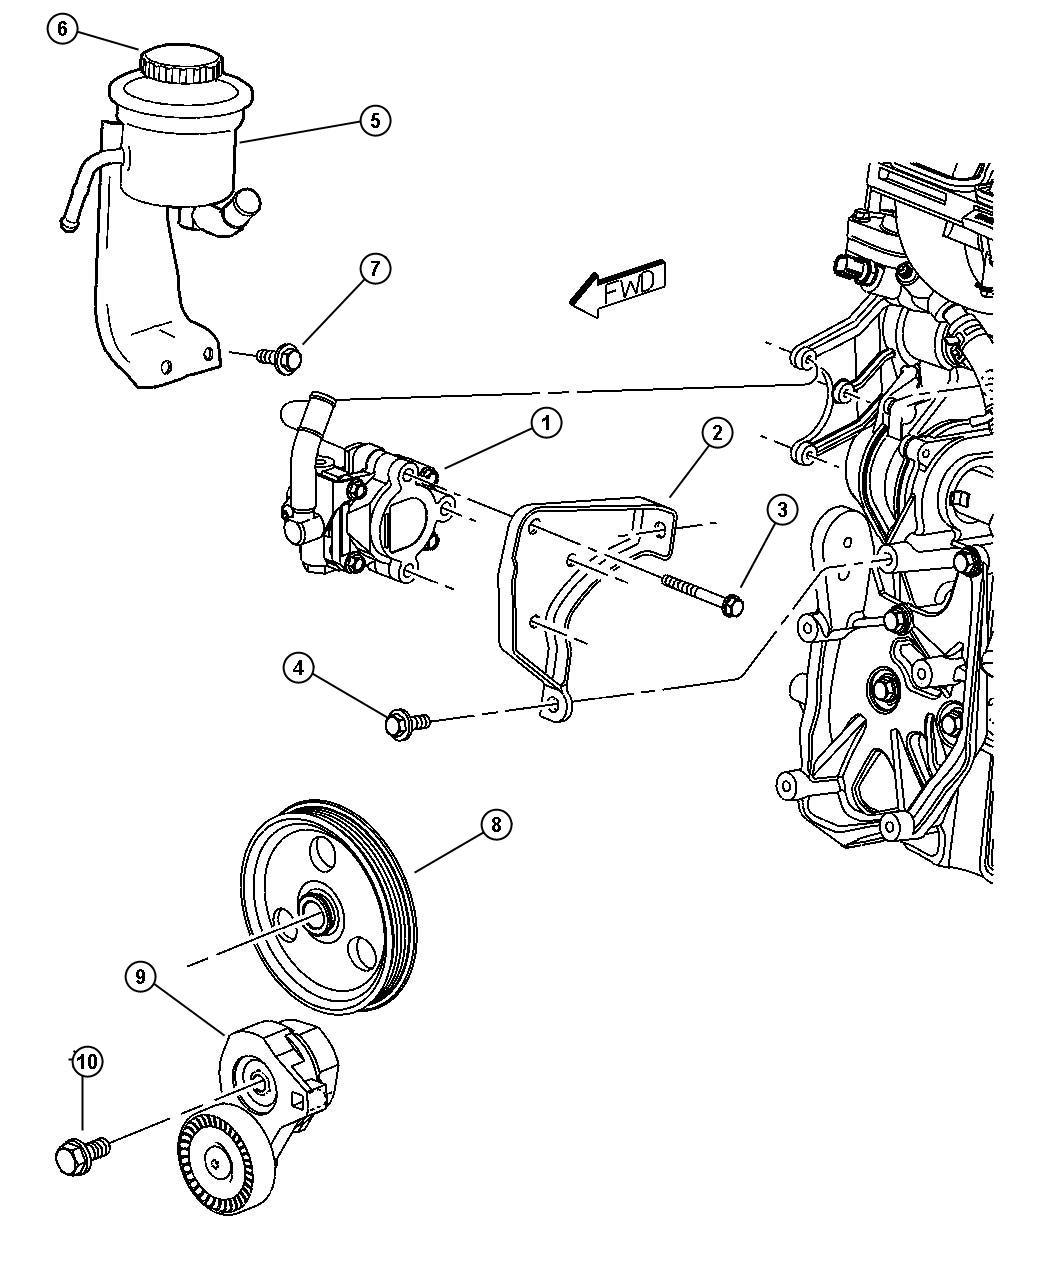 Jeep Wrangler Reservoir Power Steering Fluid With